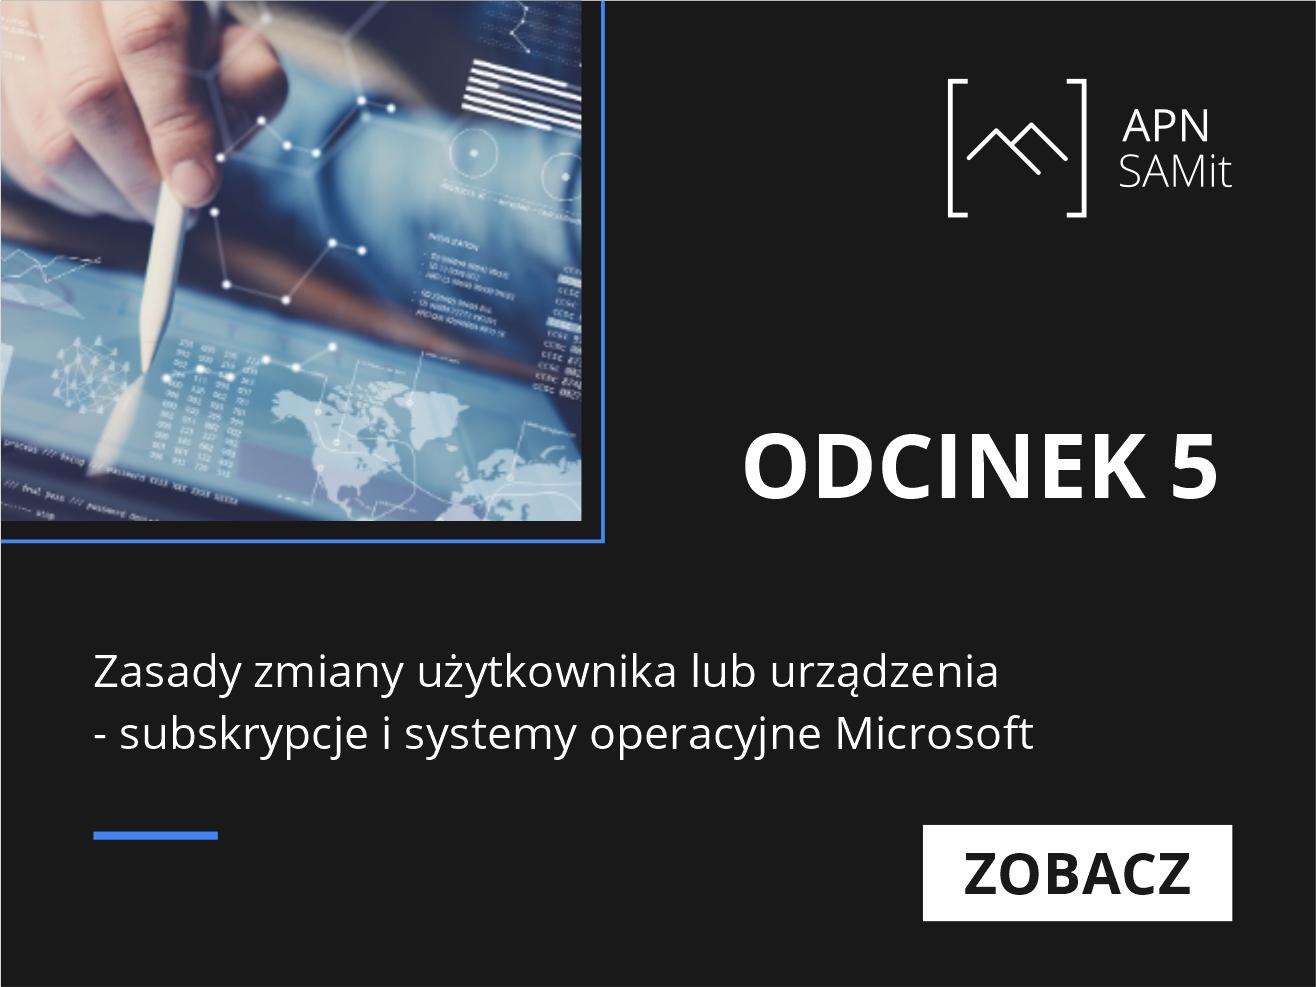 subskrypcje i systemy operacyjne Microsoft 5